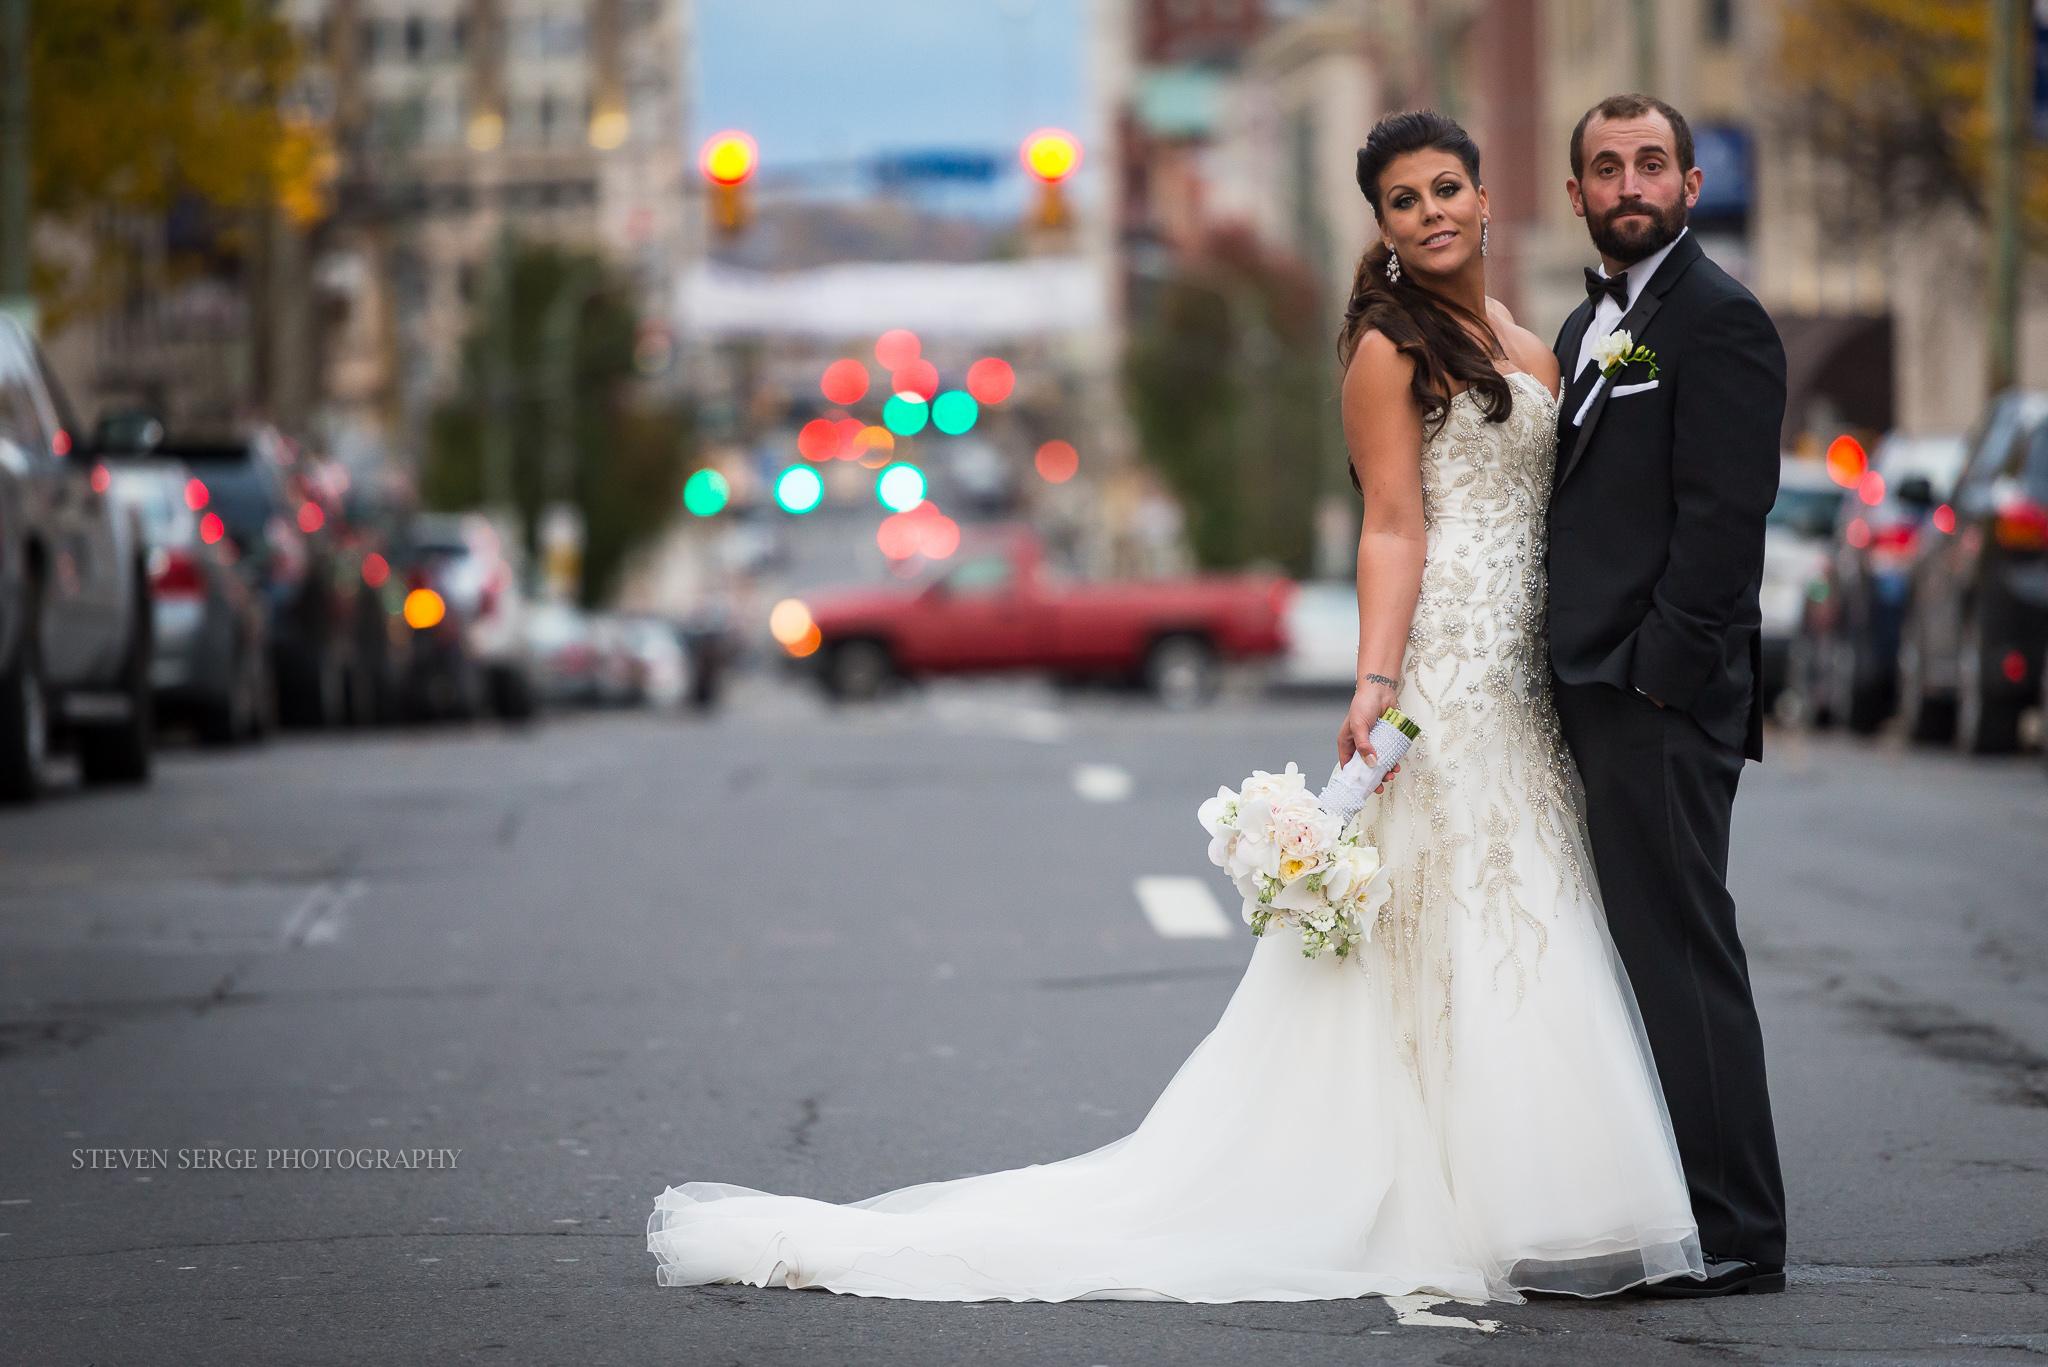 Denn-NEPA-Scranton-wedding-photographer-cultural-downtown-street-photography-dress-5.jpg